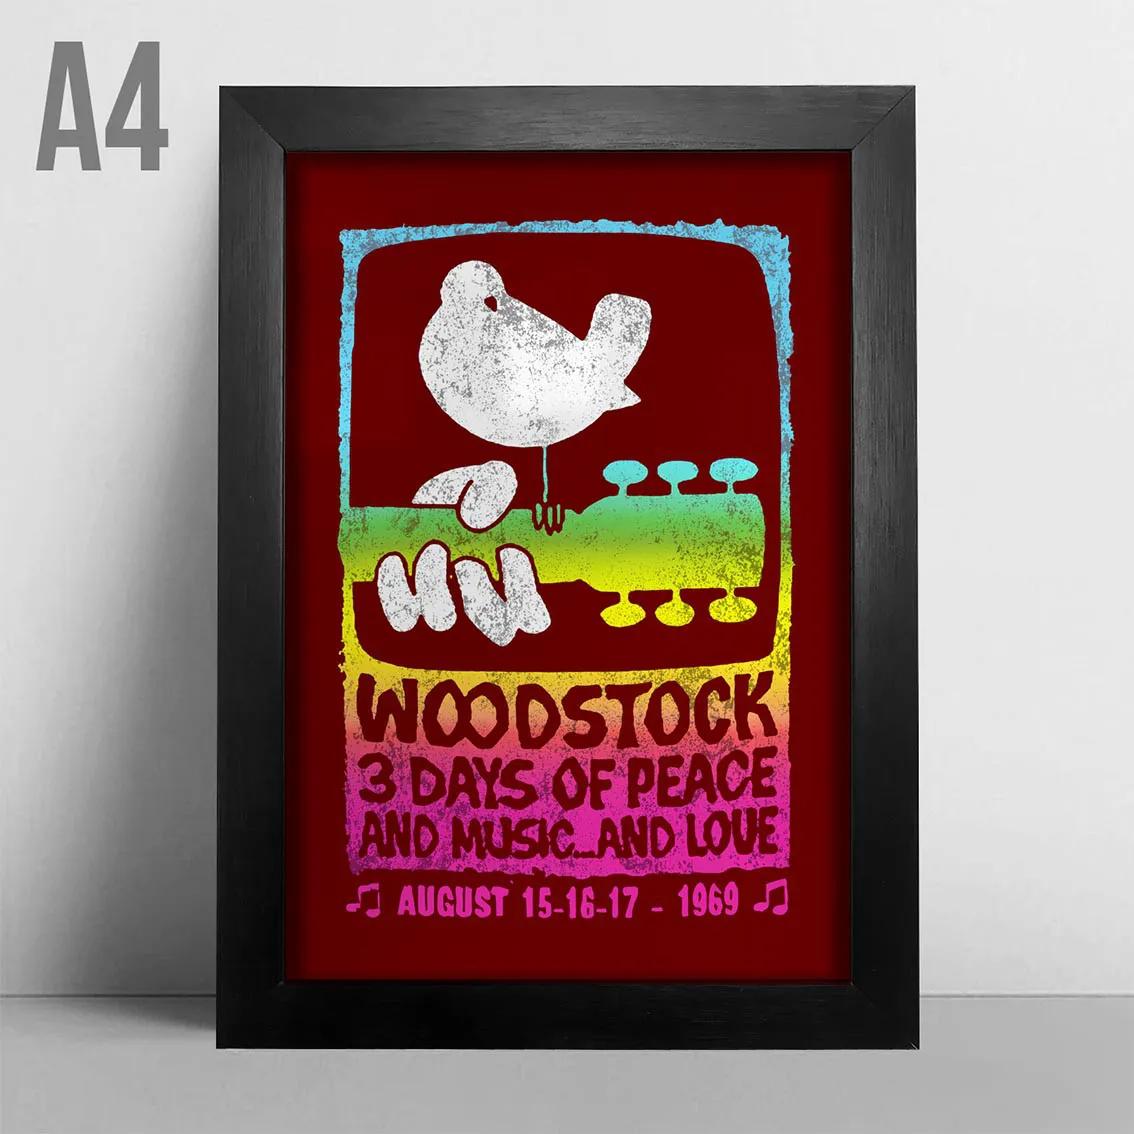 Quadro A4 - Woodstock Original